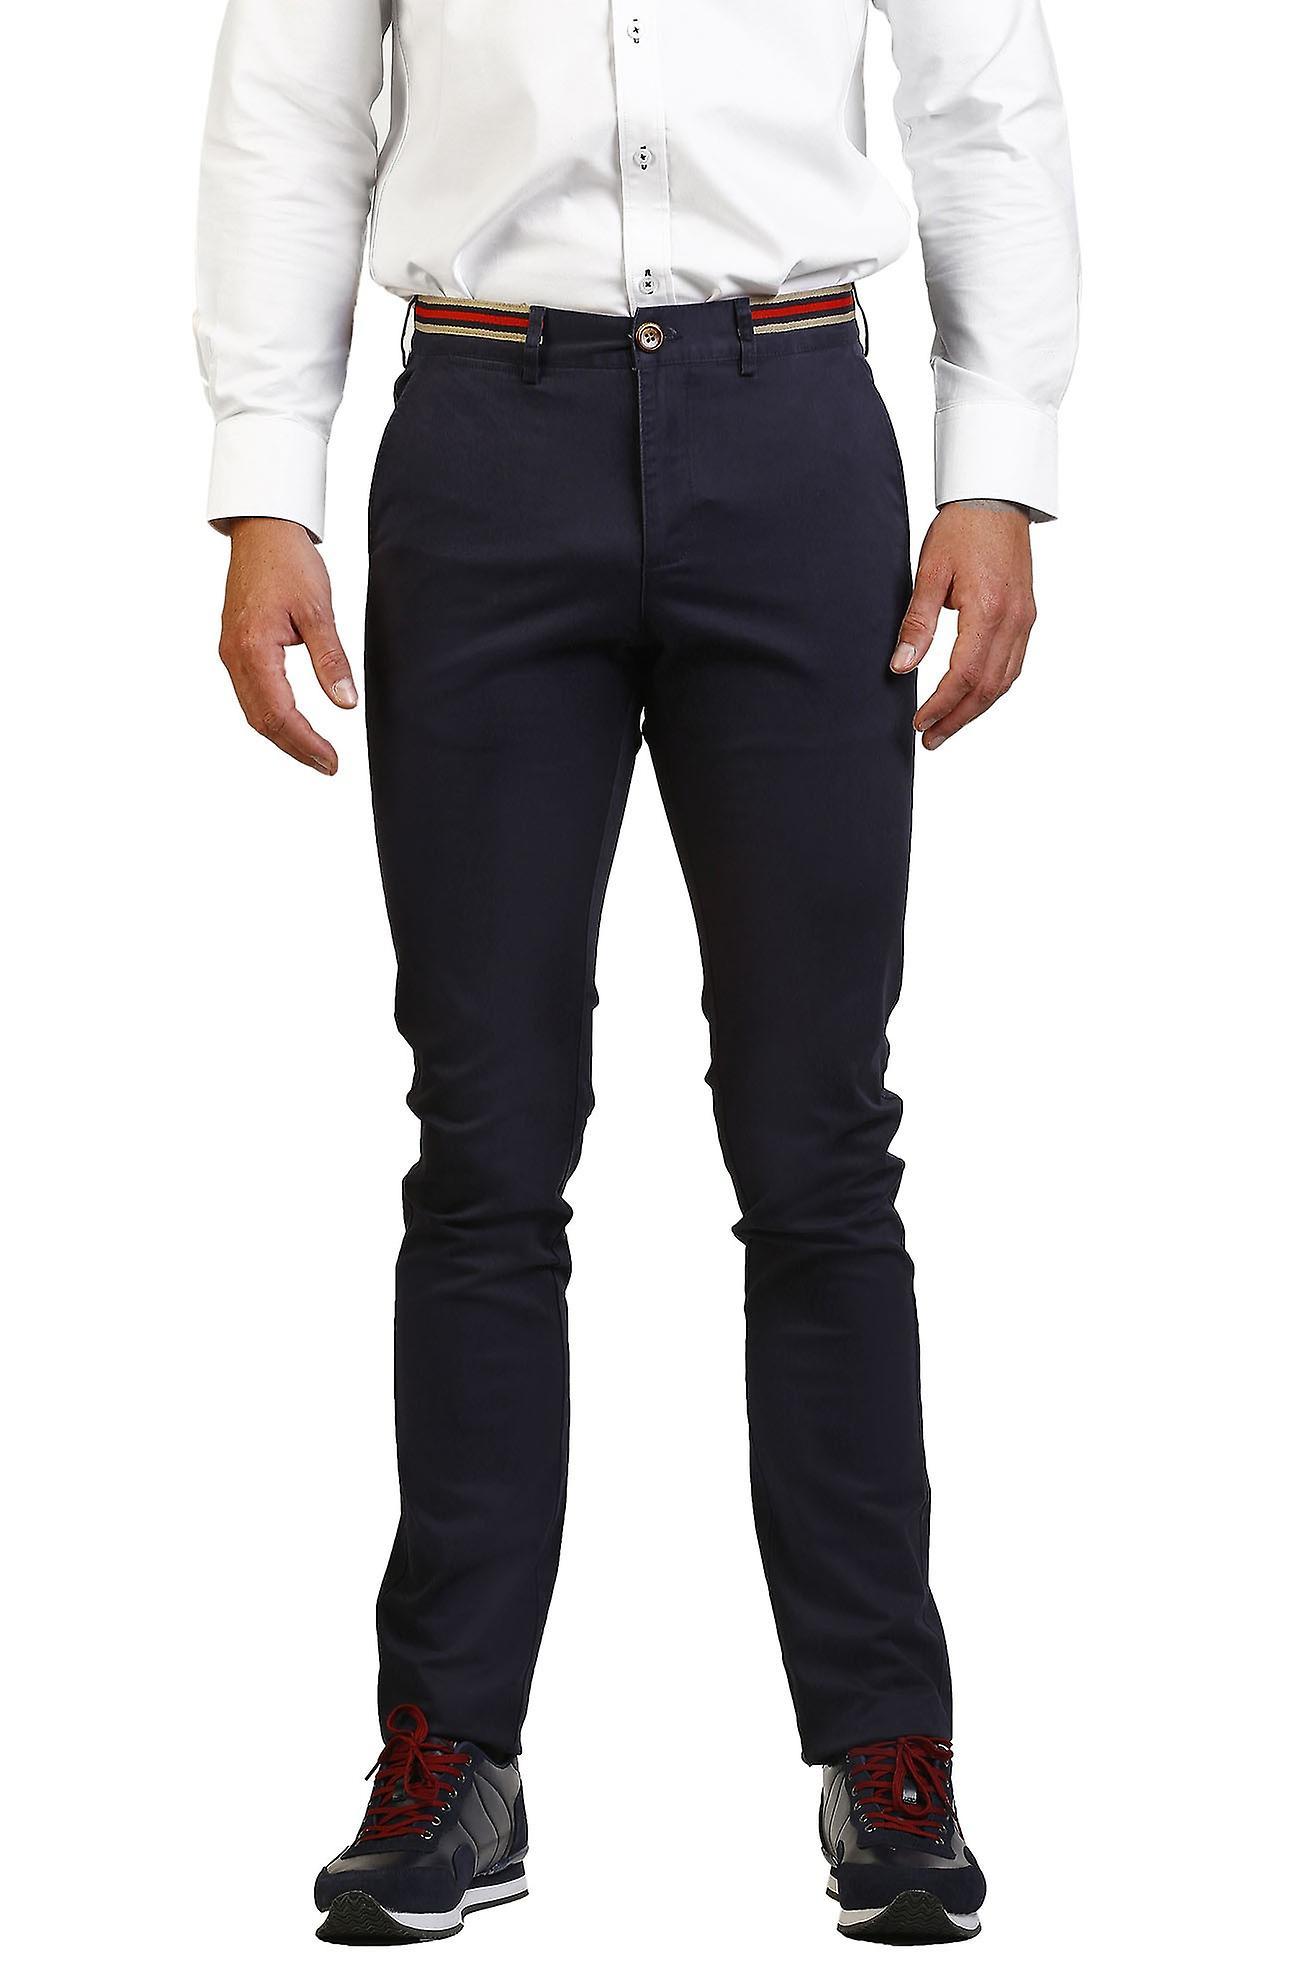 Pantalon Hombre The Time Of Bocha JI1PPOLO-11-Marino 710